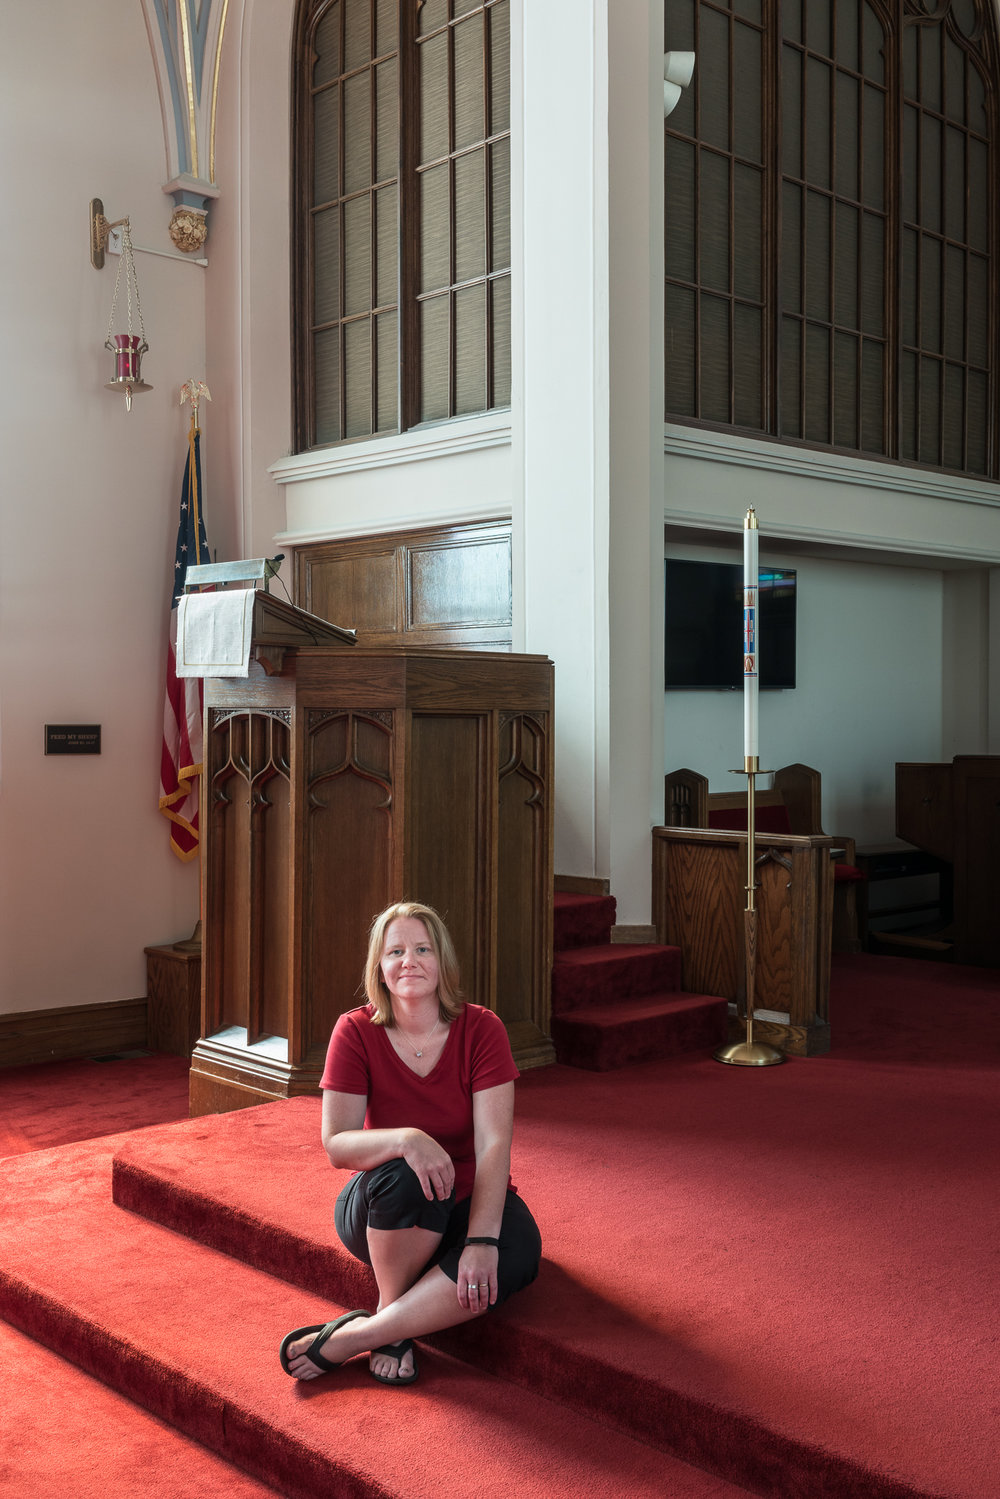 Rachael at St. John's Church, Mascoutah, Illinois, 2017